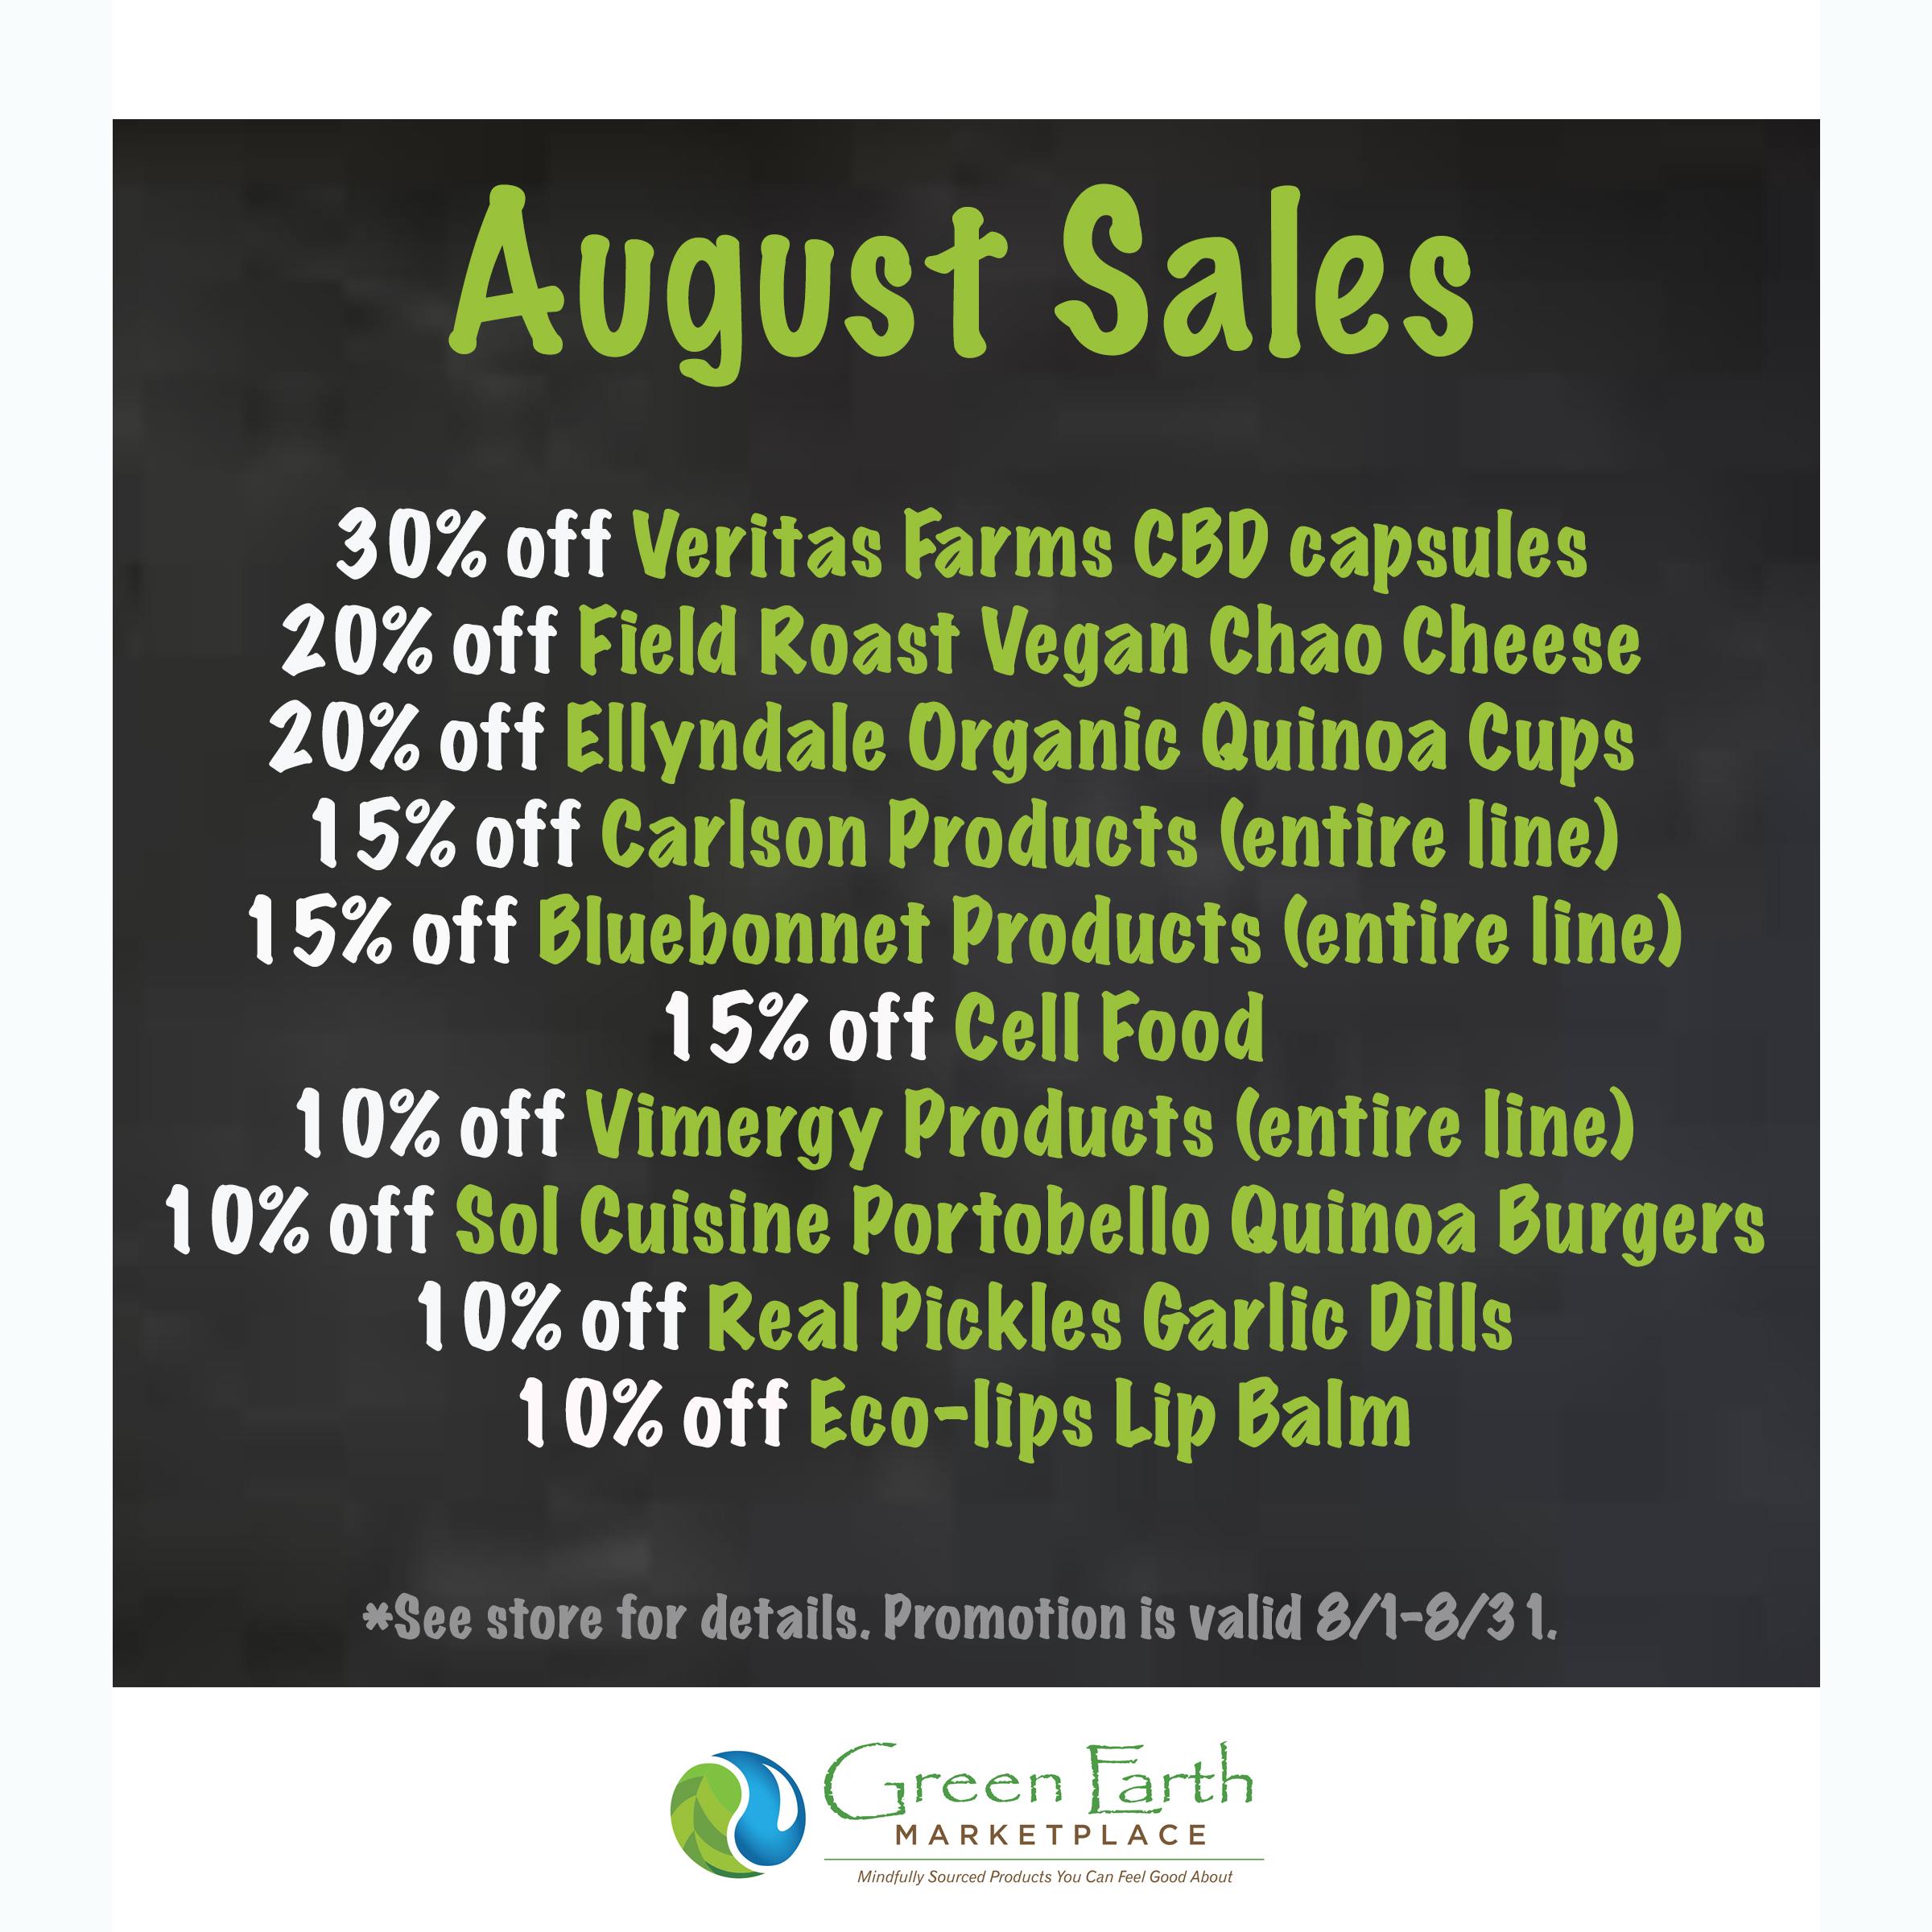 2020 August Sales